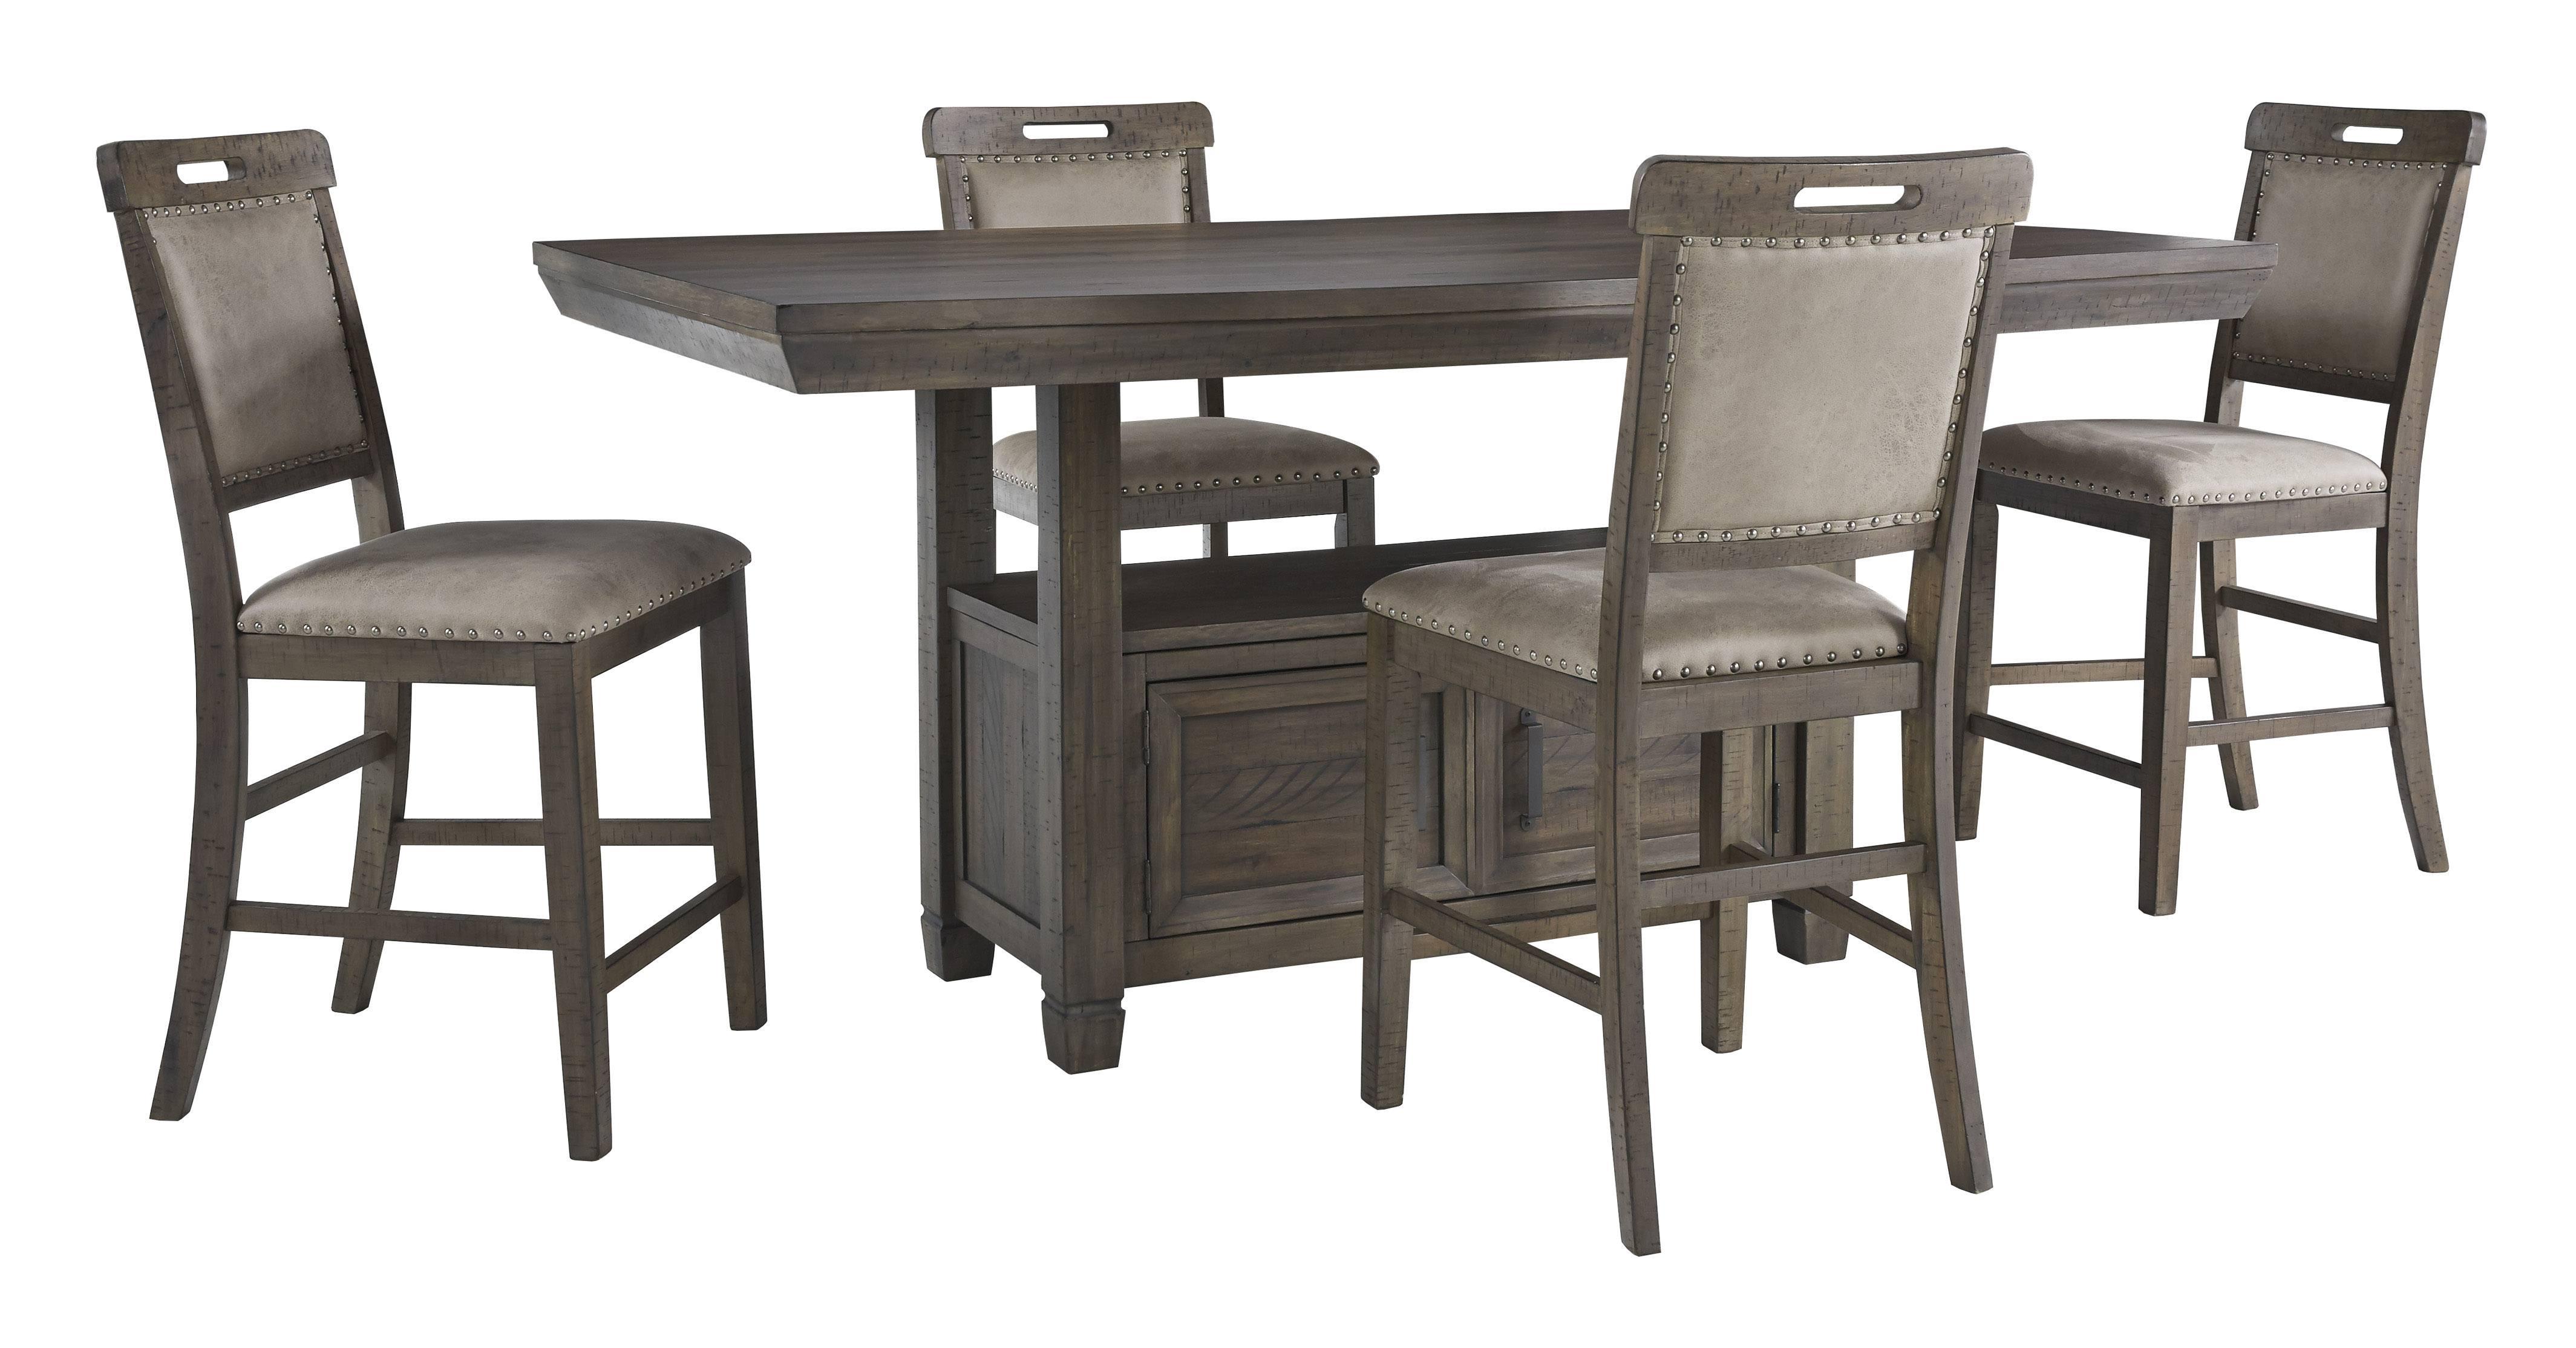 Ashley Furniture Johurst Rectangular Counter Dining Room Set in Grayish  Brown